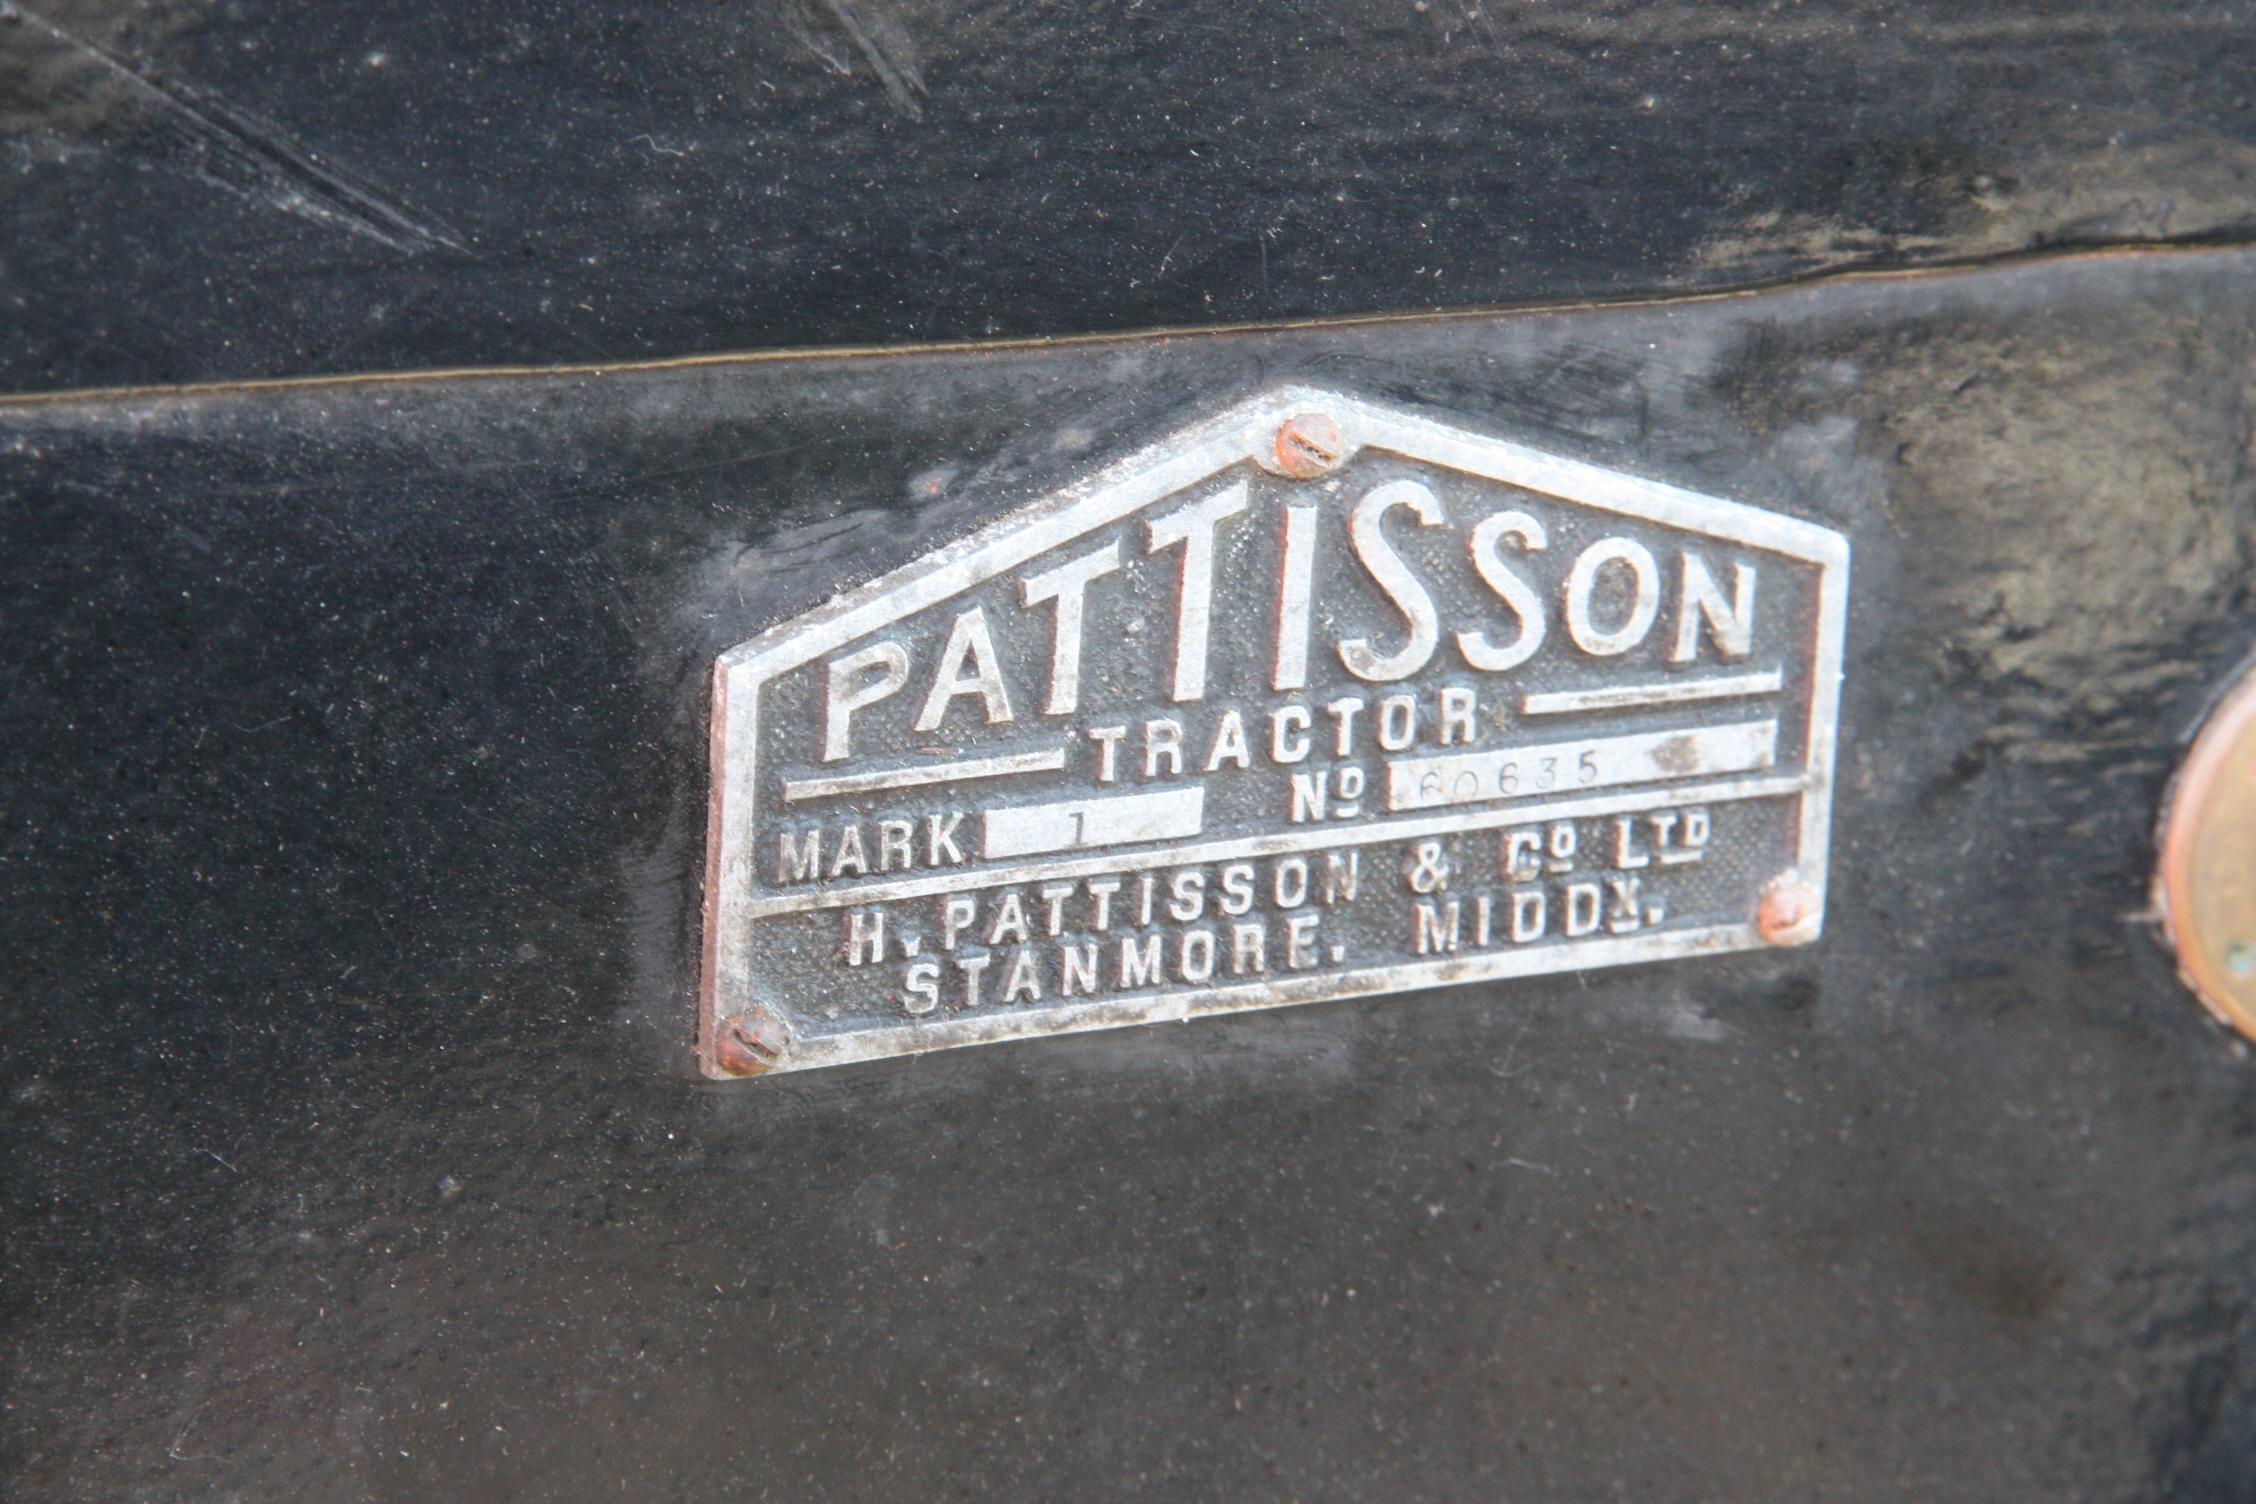 Pattisson